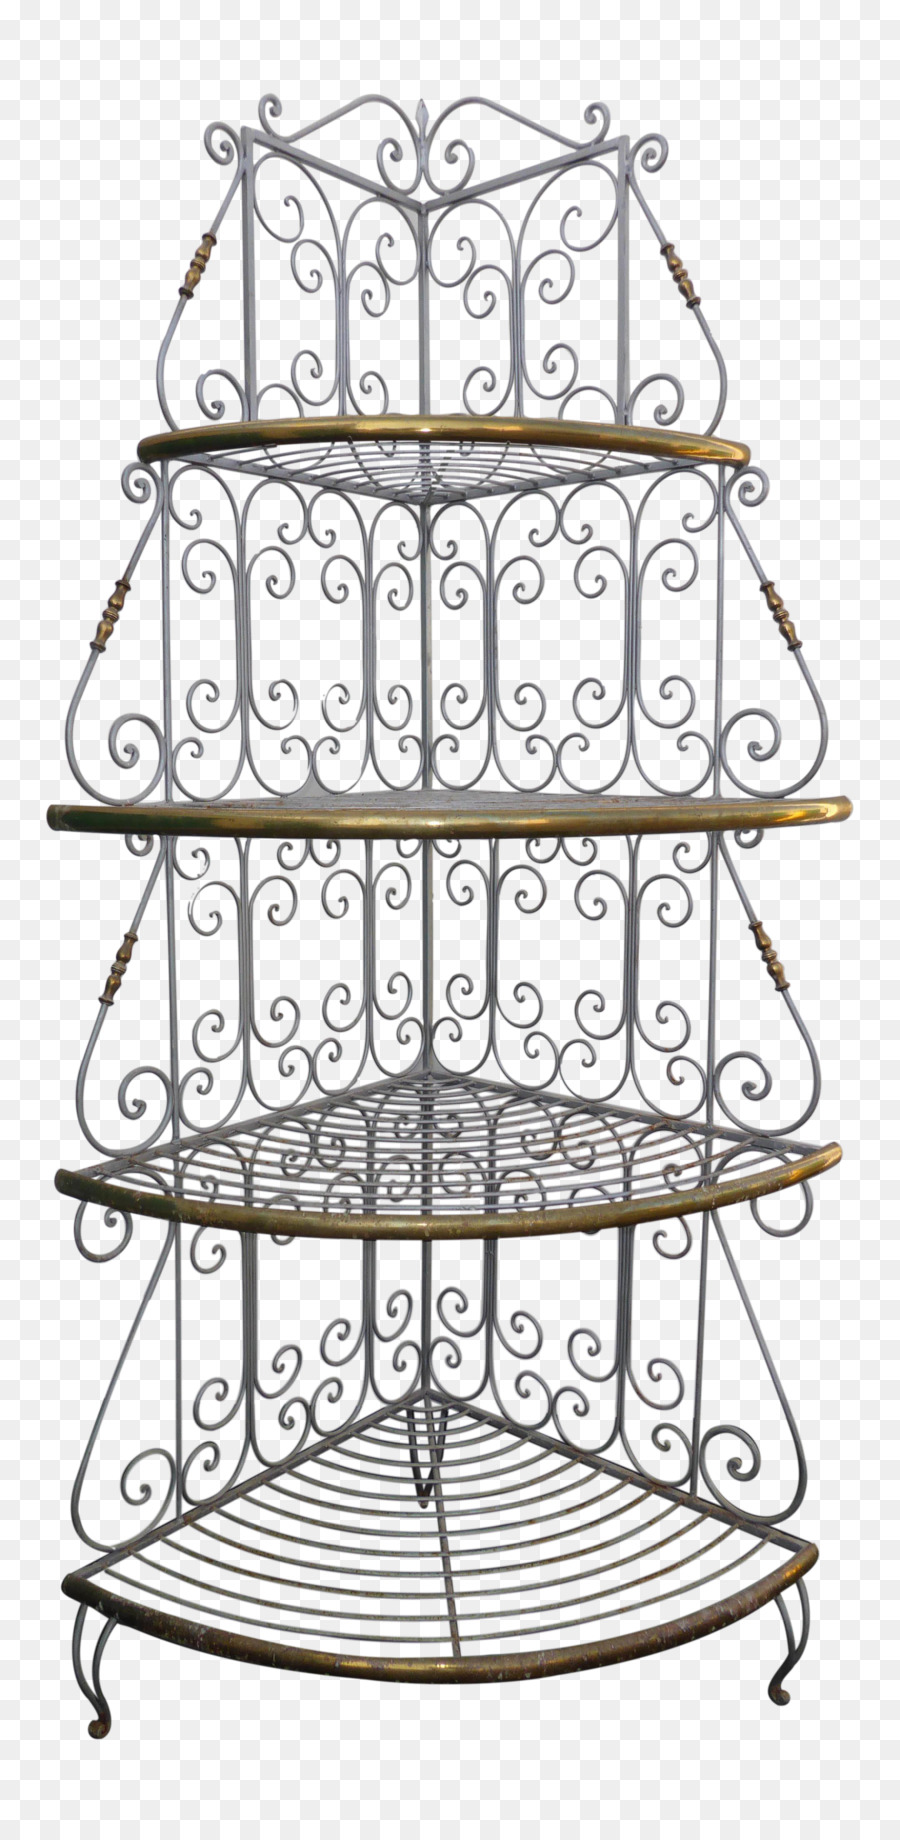 Wrought iron shelf clipart vector download Kitchen Cartoon clipart - Furniture, Metal, Line ... vector download